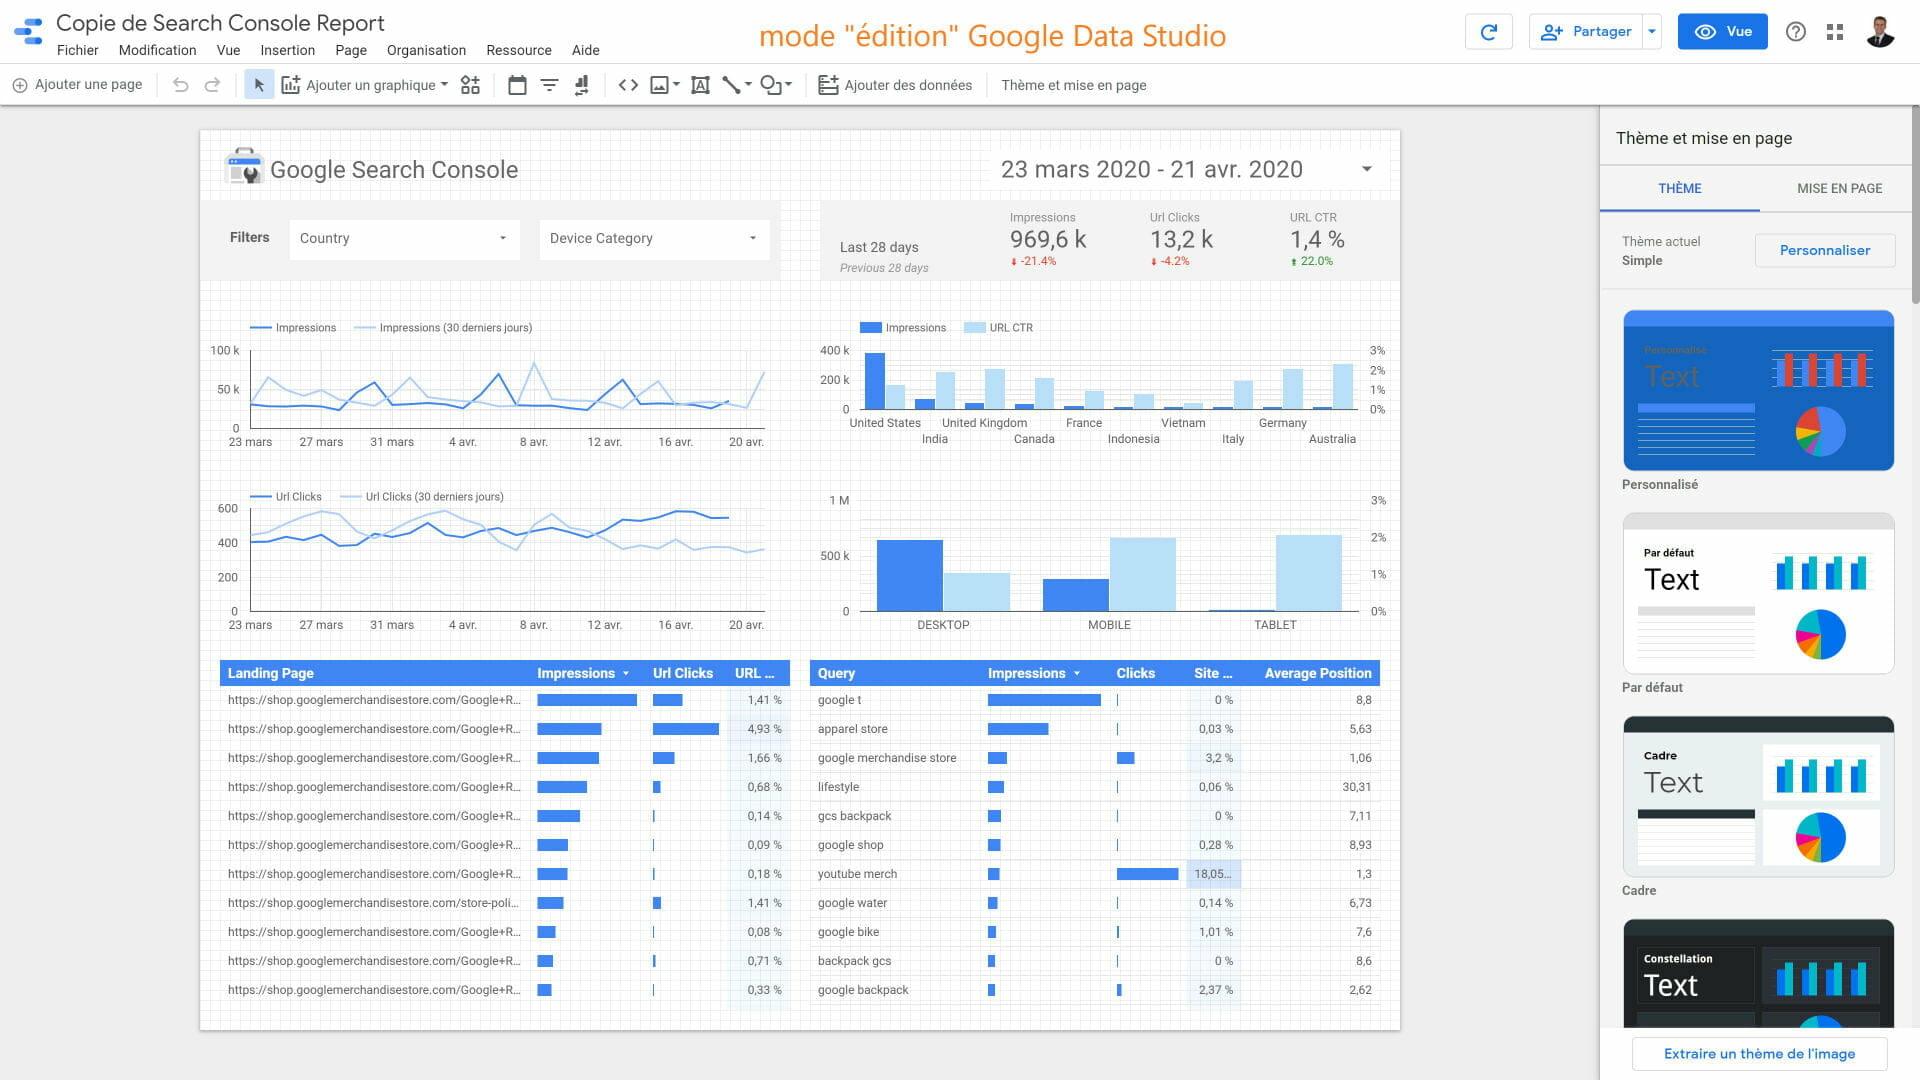 mode édition google data studio